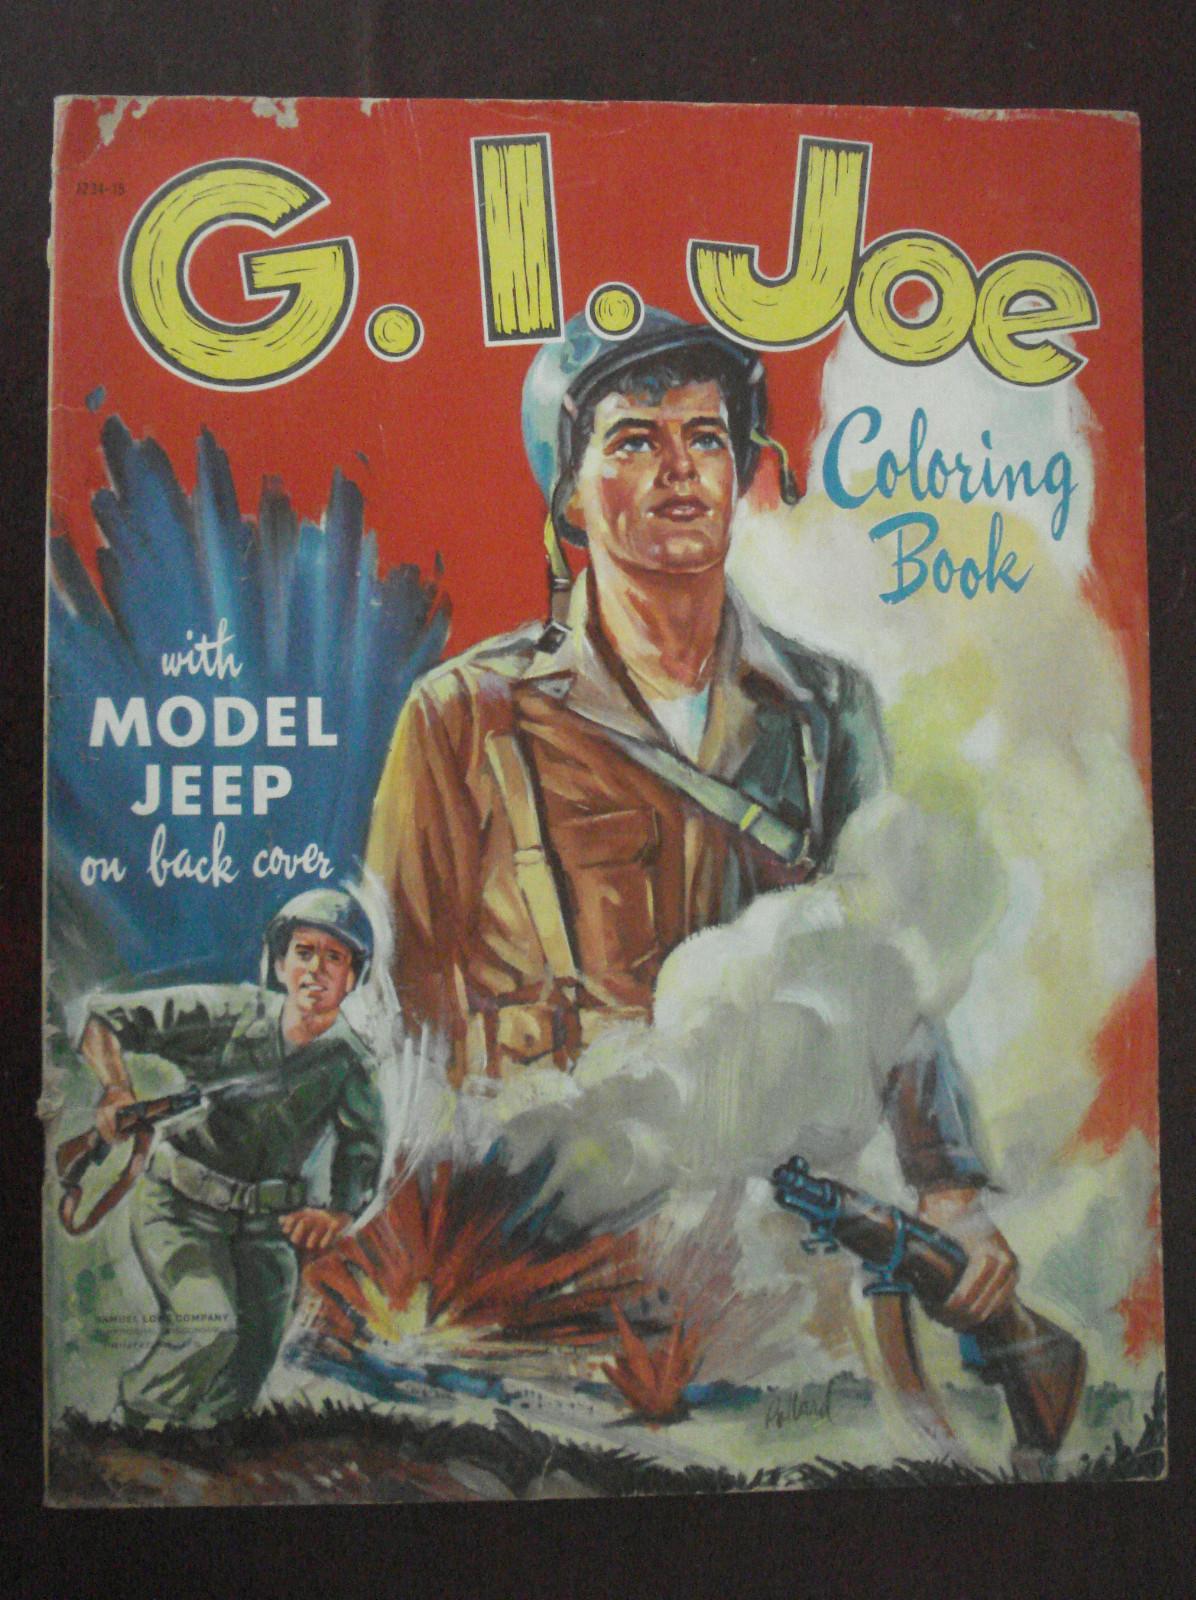 1951 GI-Joe Coloring Book on eBay | eWillys